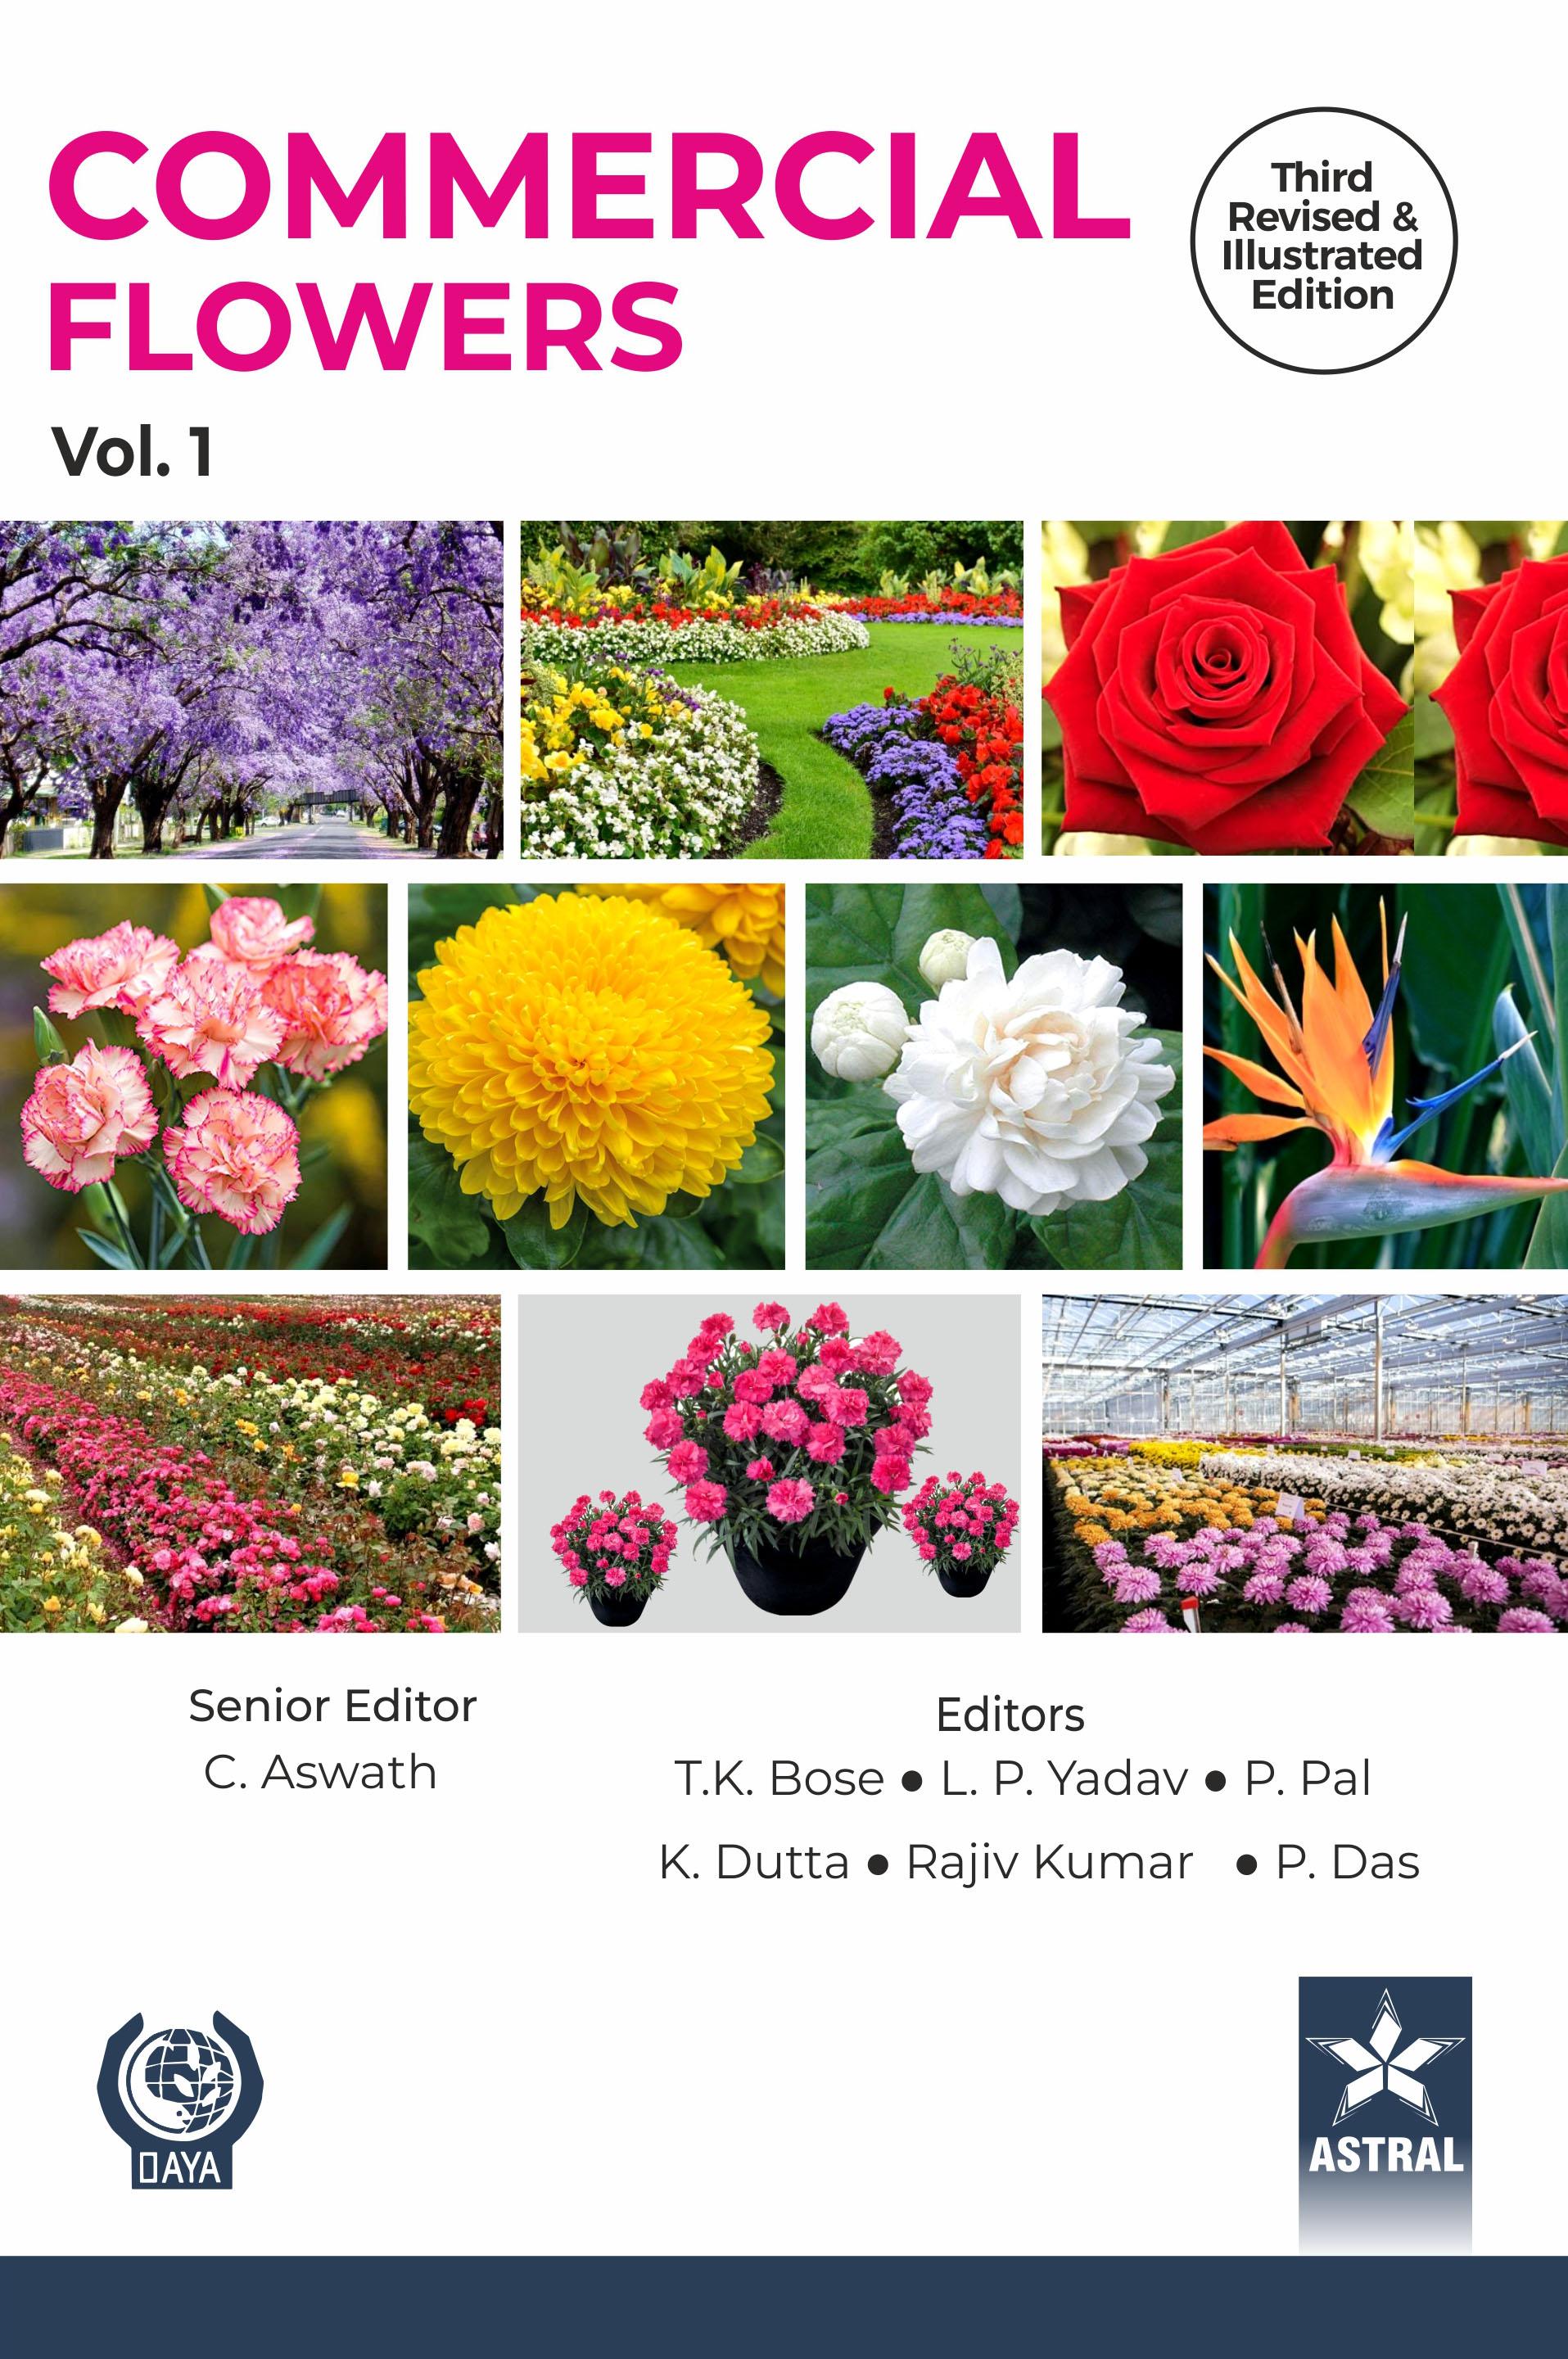 Commercial Flowers Vol. 1 (Third Revised & Illustr…